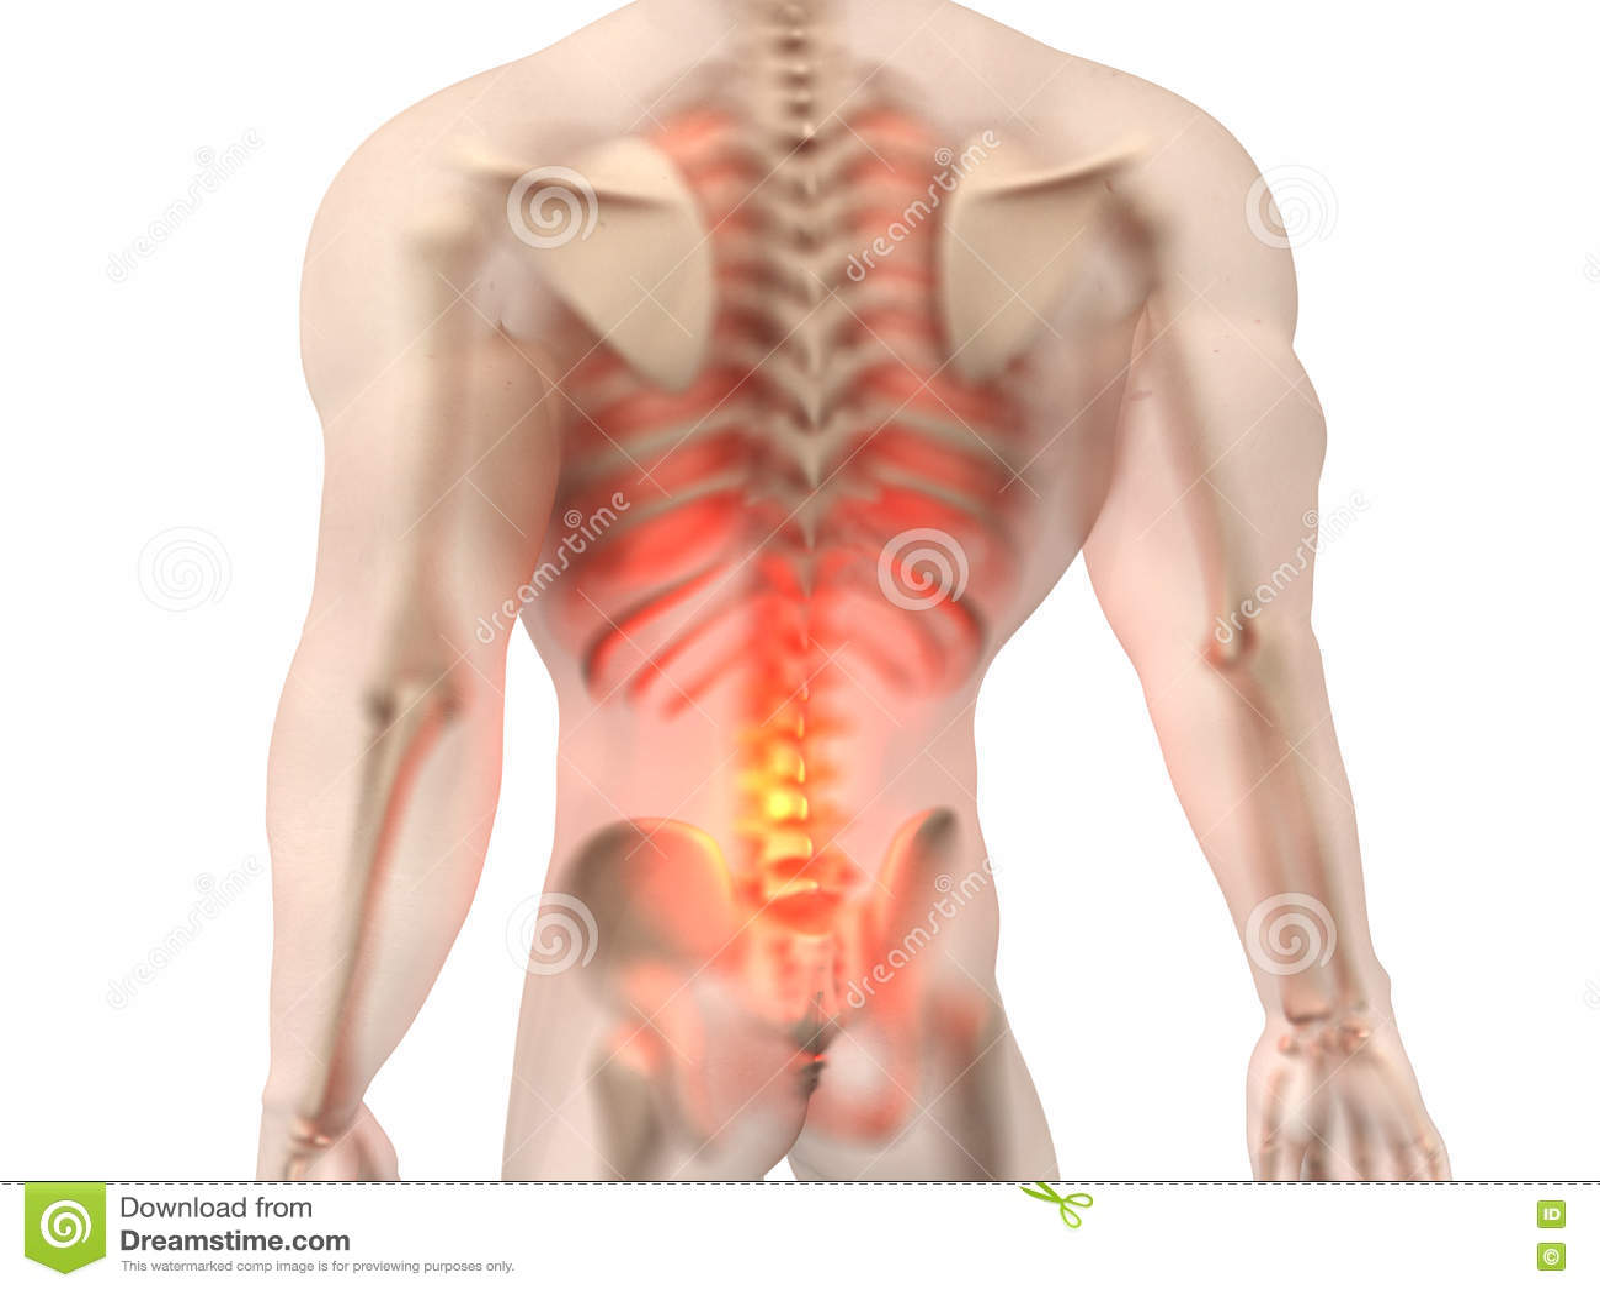 Male Anatomy - Back Pain stock illustration. Illustration of healthy ...